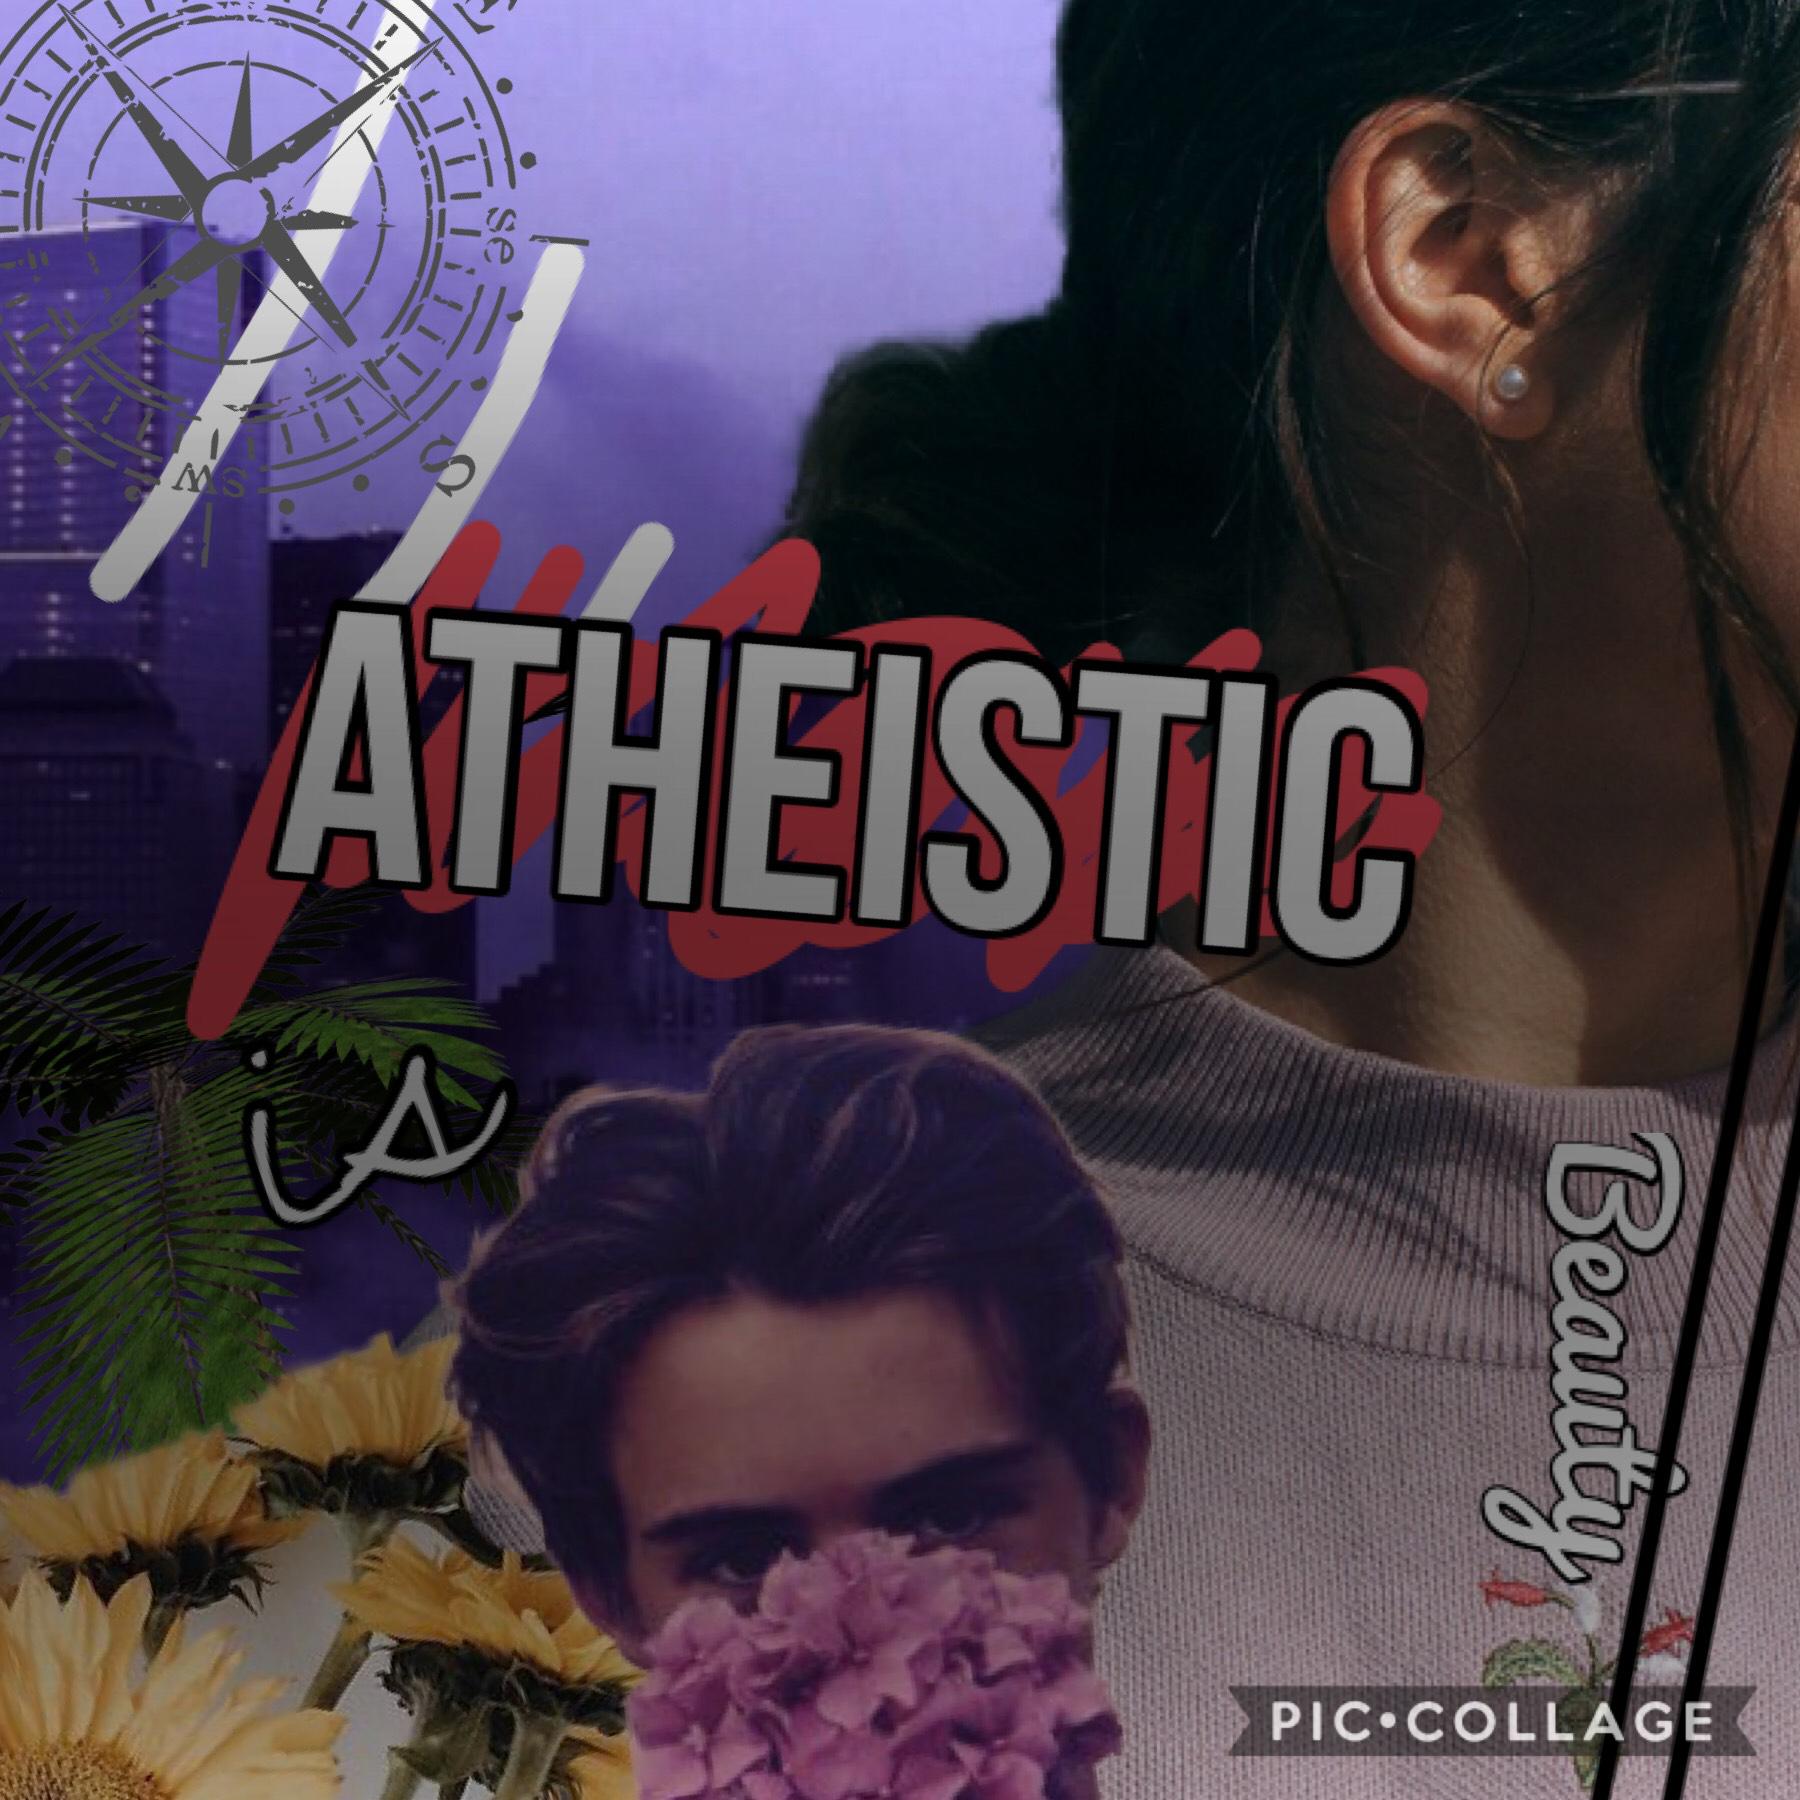 Atheistic Collab